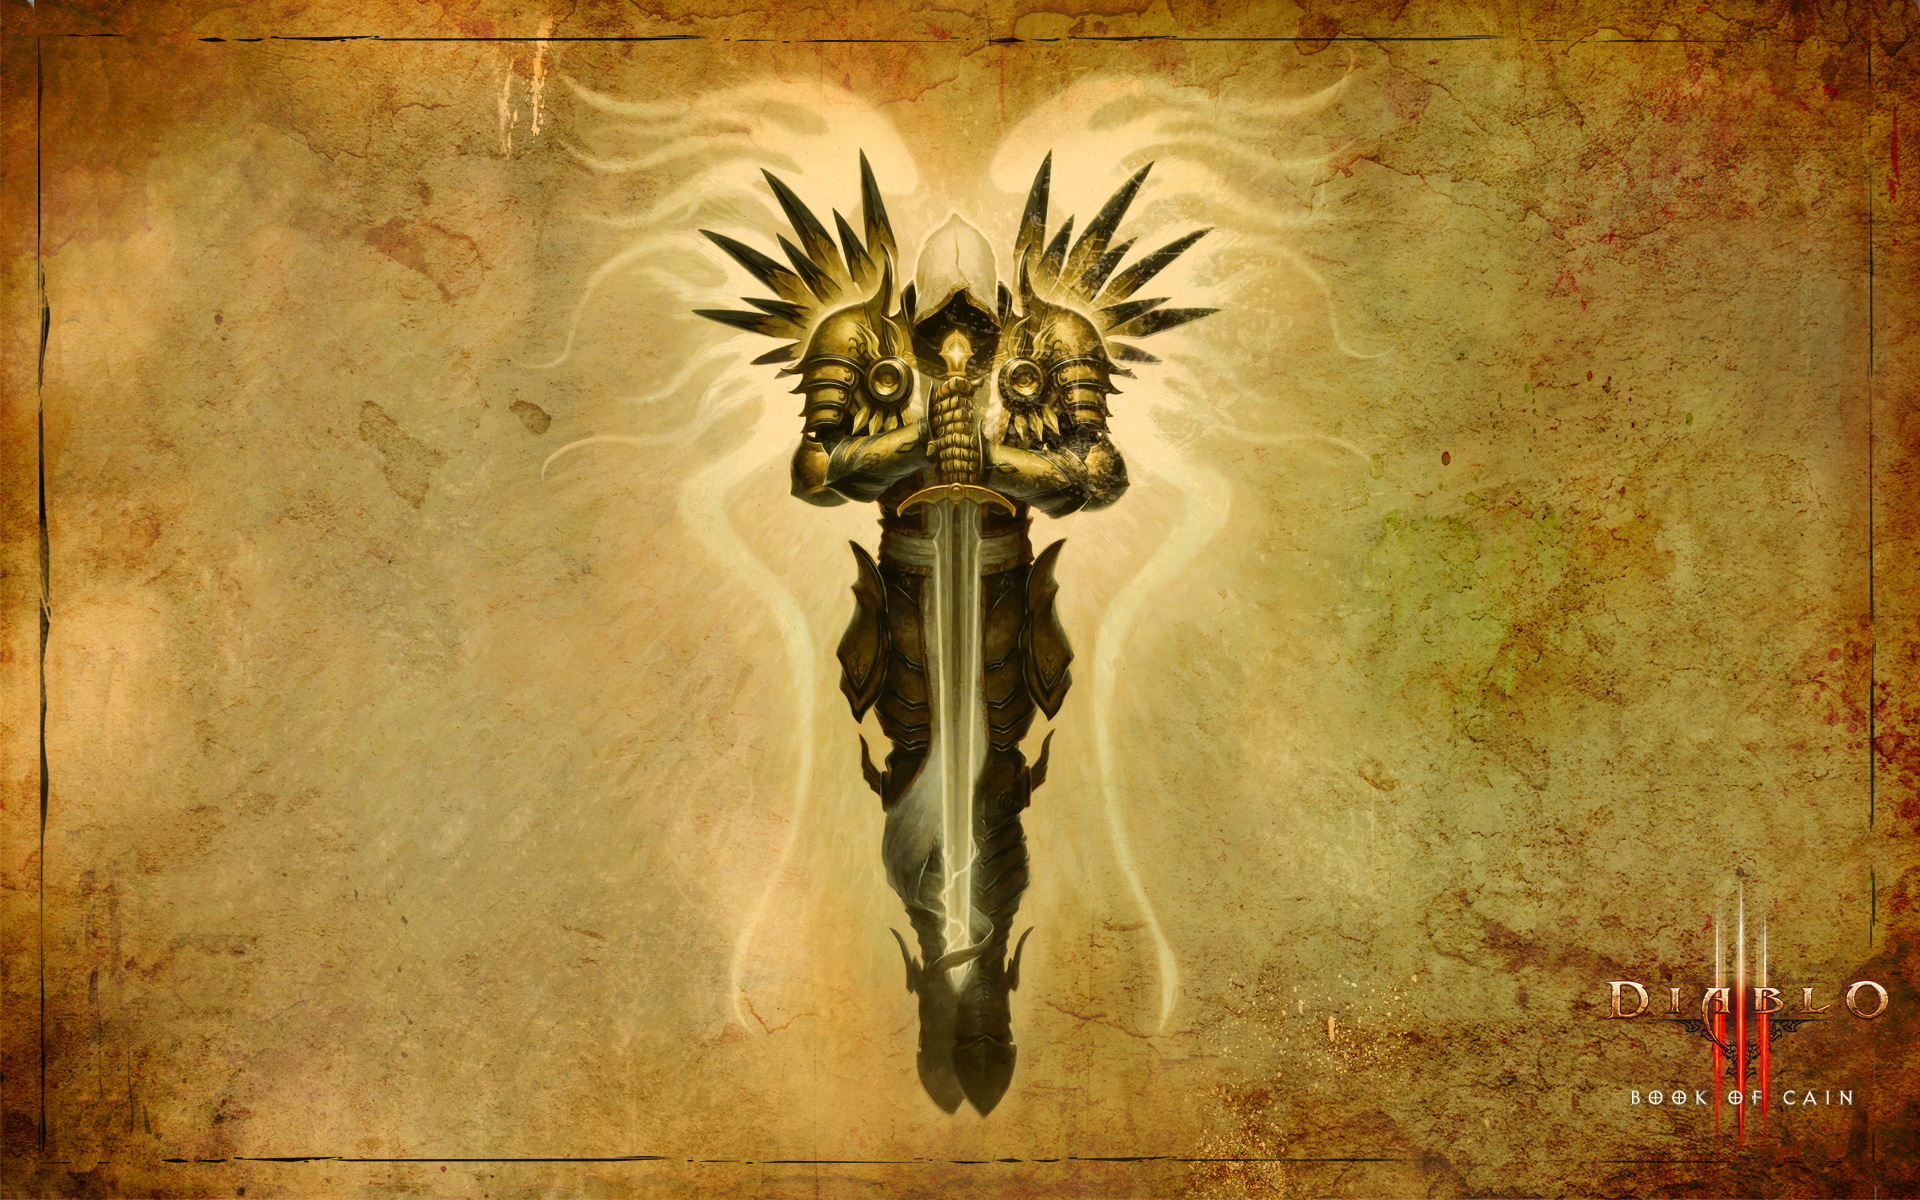 Diablo 3 wallpaper 15